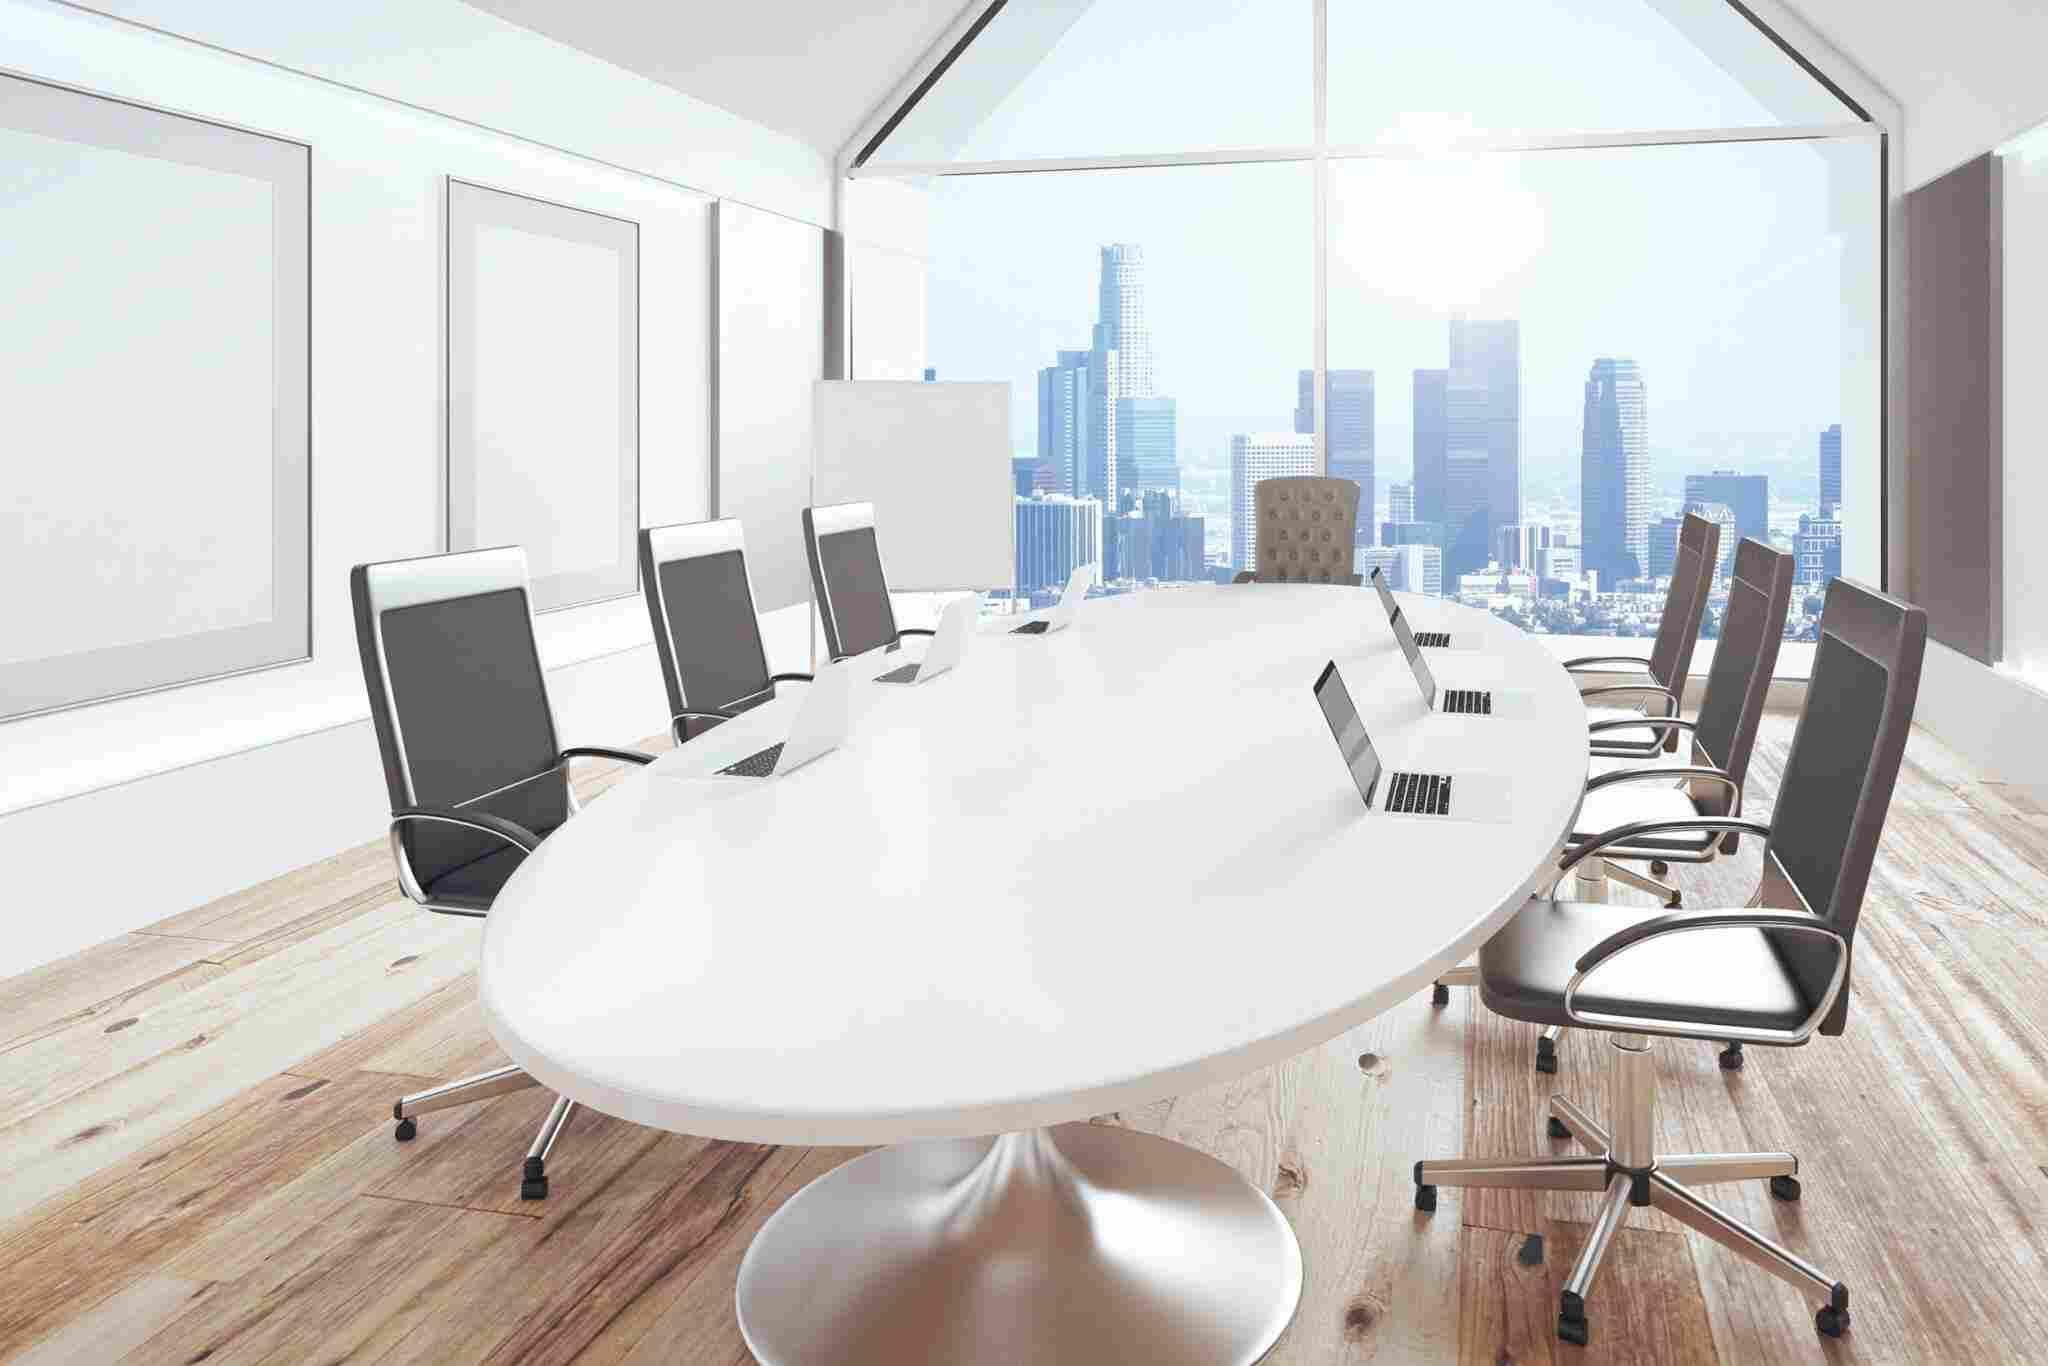 http://kpk-lenk.de/wp-content/uploads/2017/05/image-office-chairs.jpg